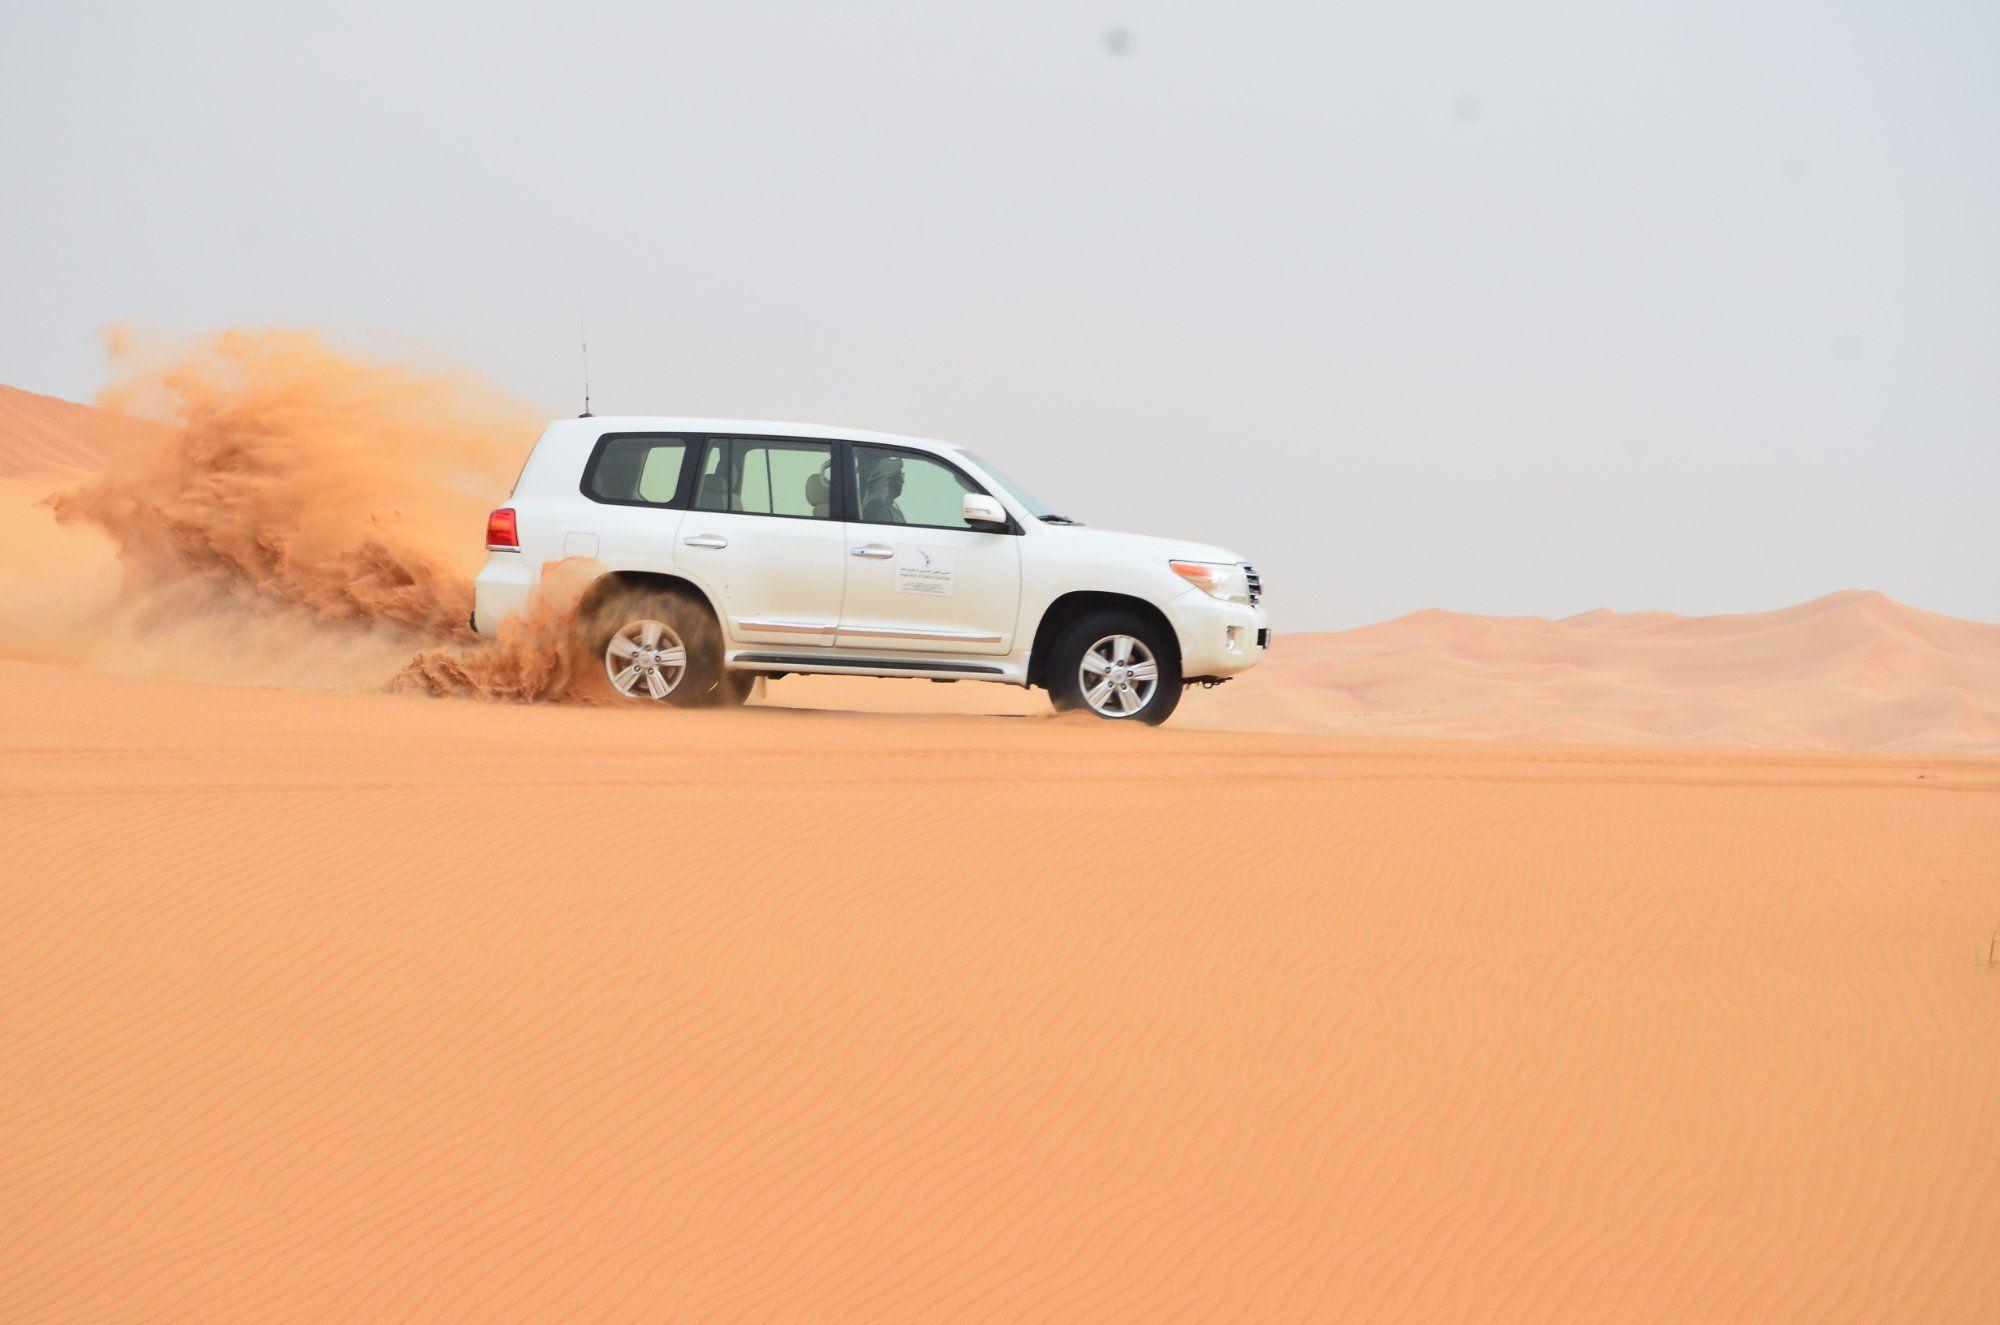 Enjoy a ride in the desert